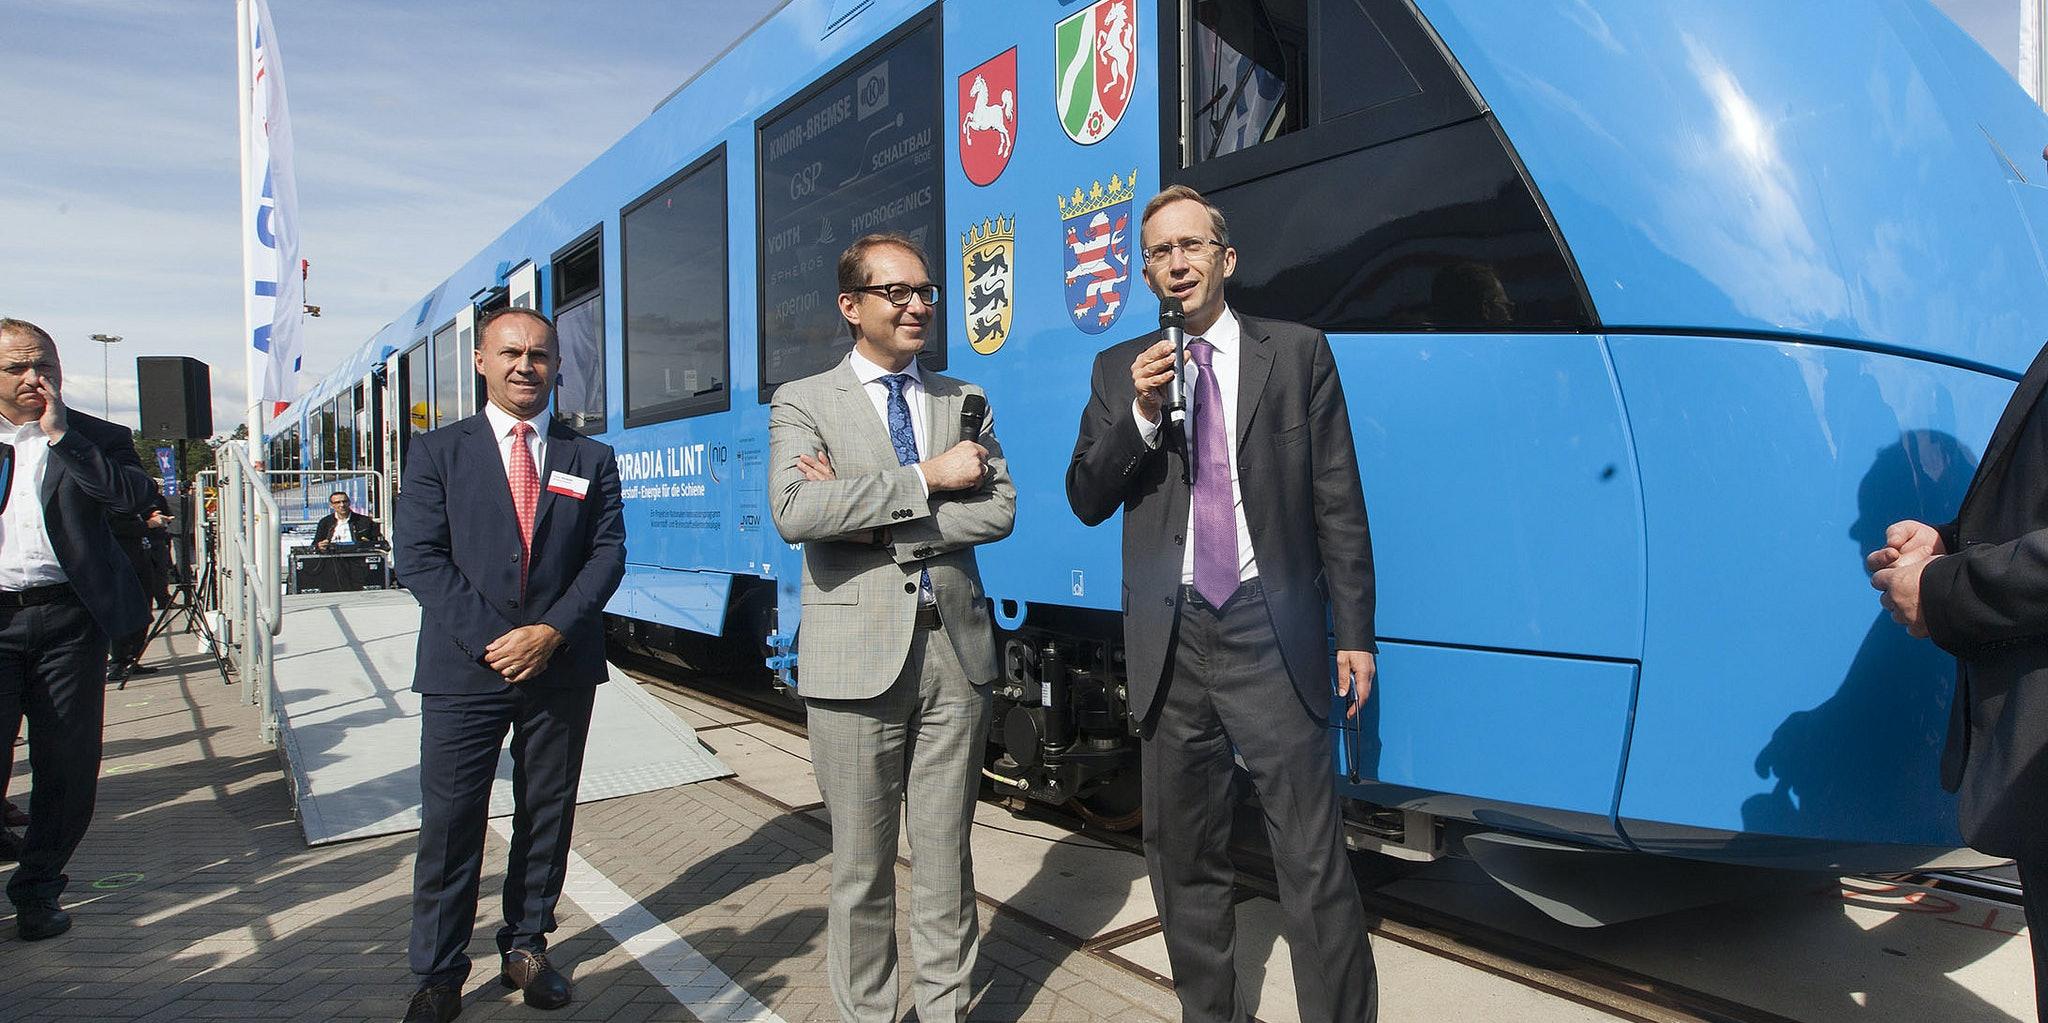 Alstom's Coradia iLint, a hydrogen-powered passenger train.